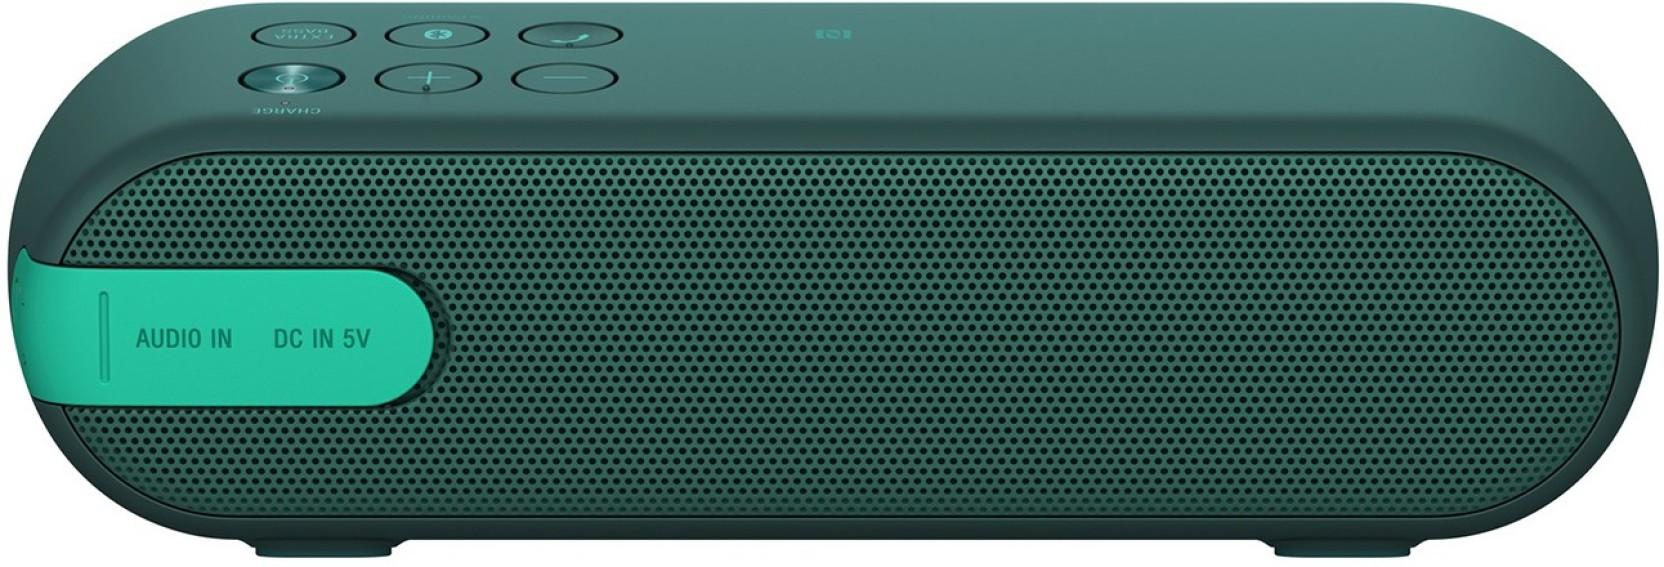 Sony SRS-XB2/GC 20 W Portable Bluetooth Speaker (Green, Stereo Channel)